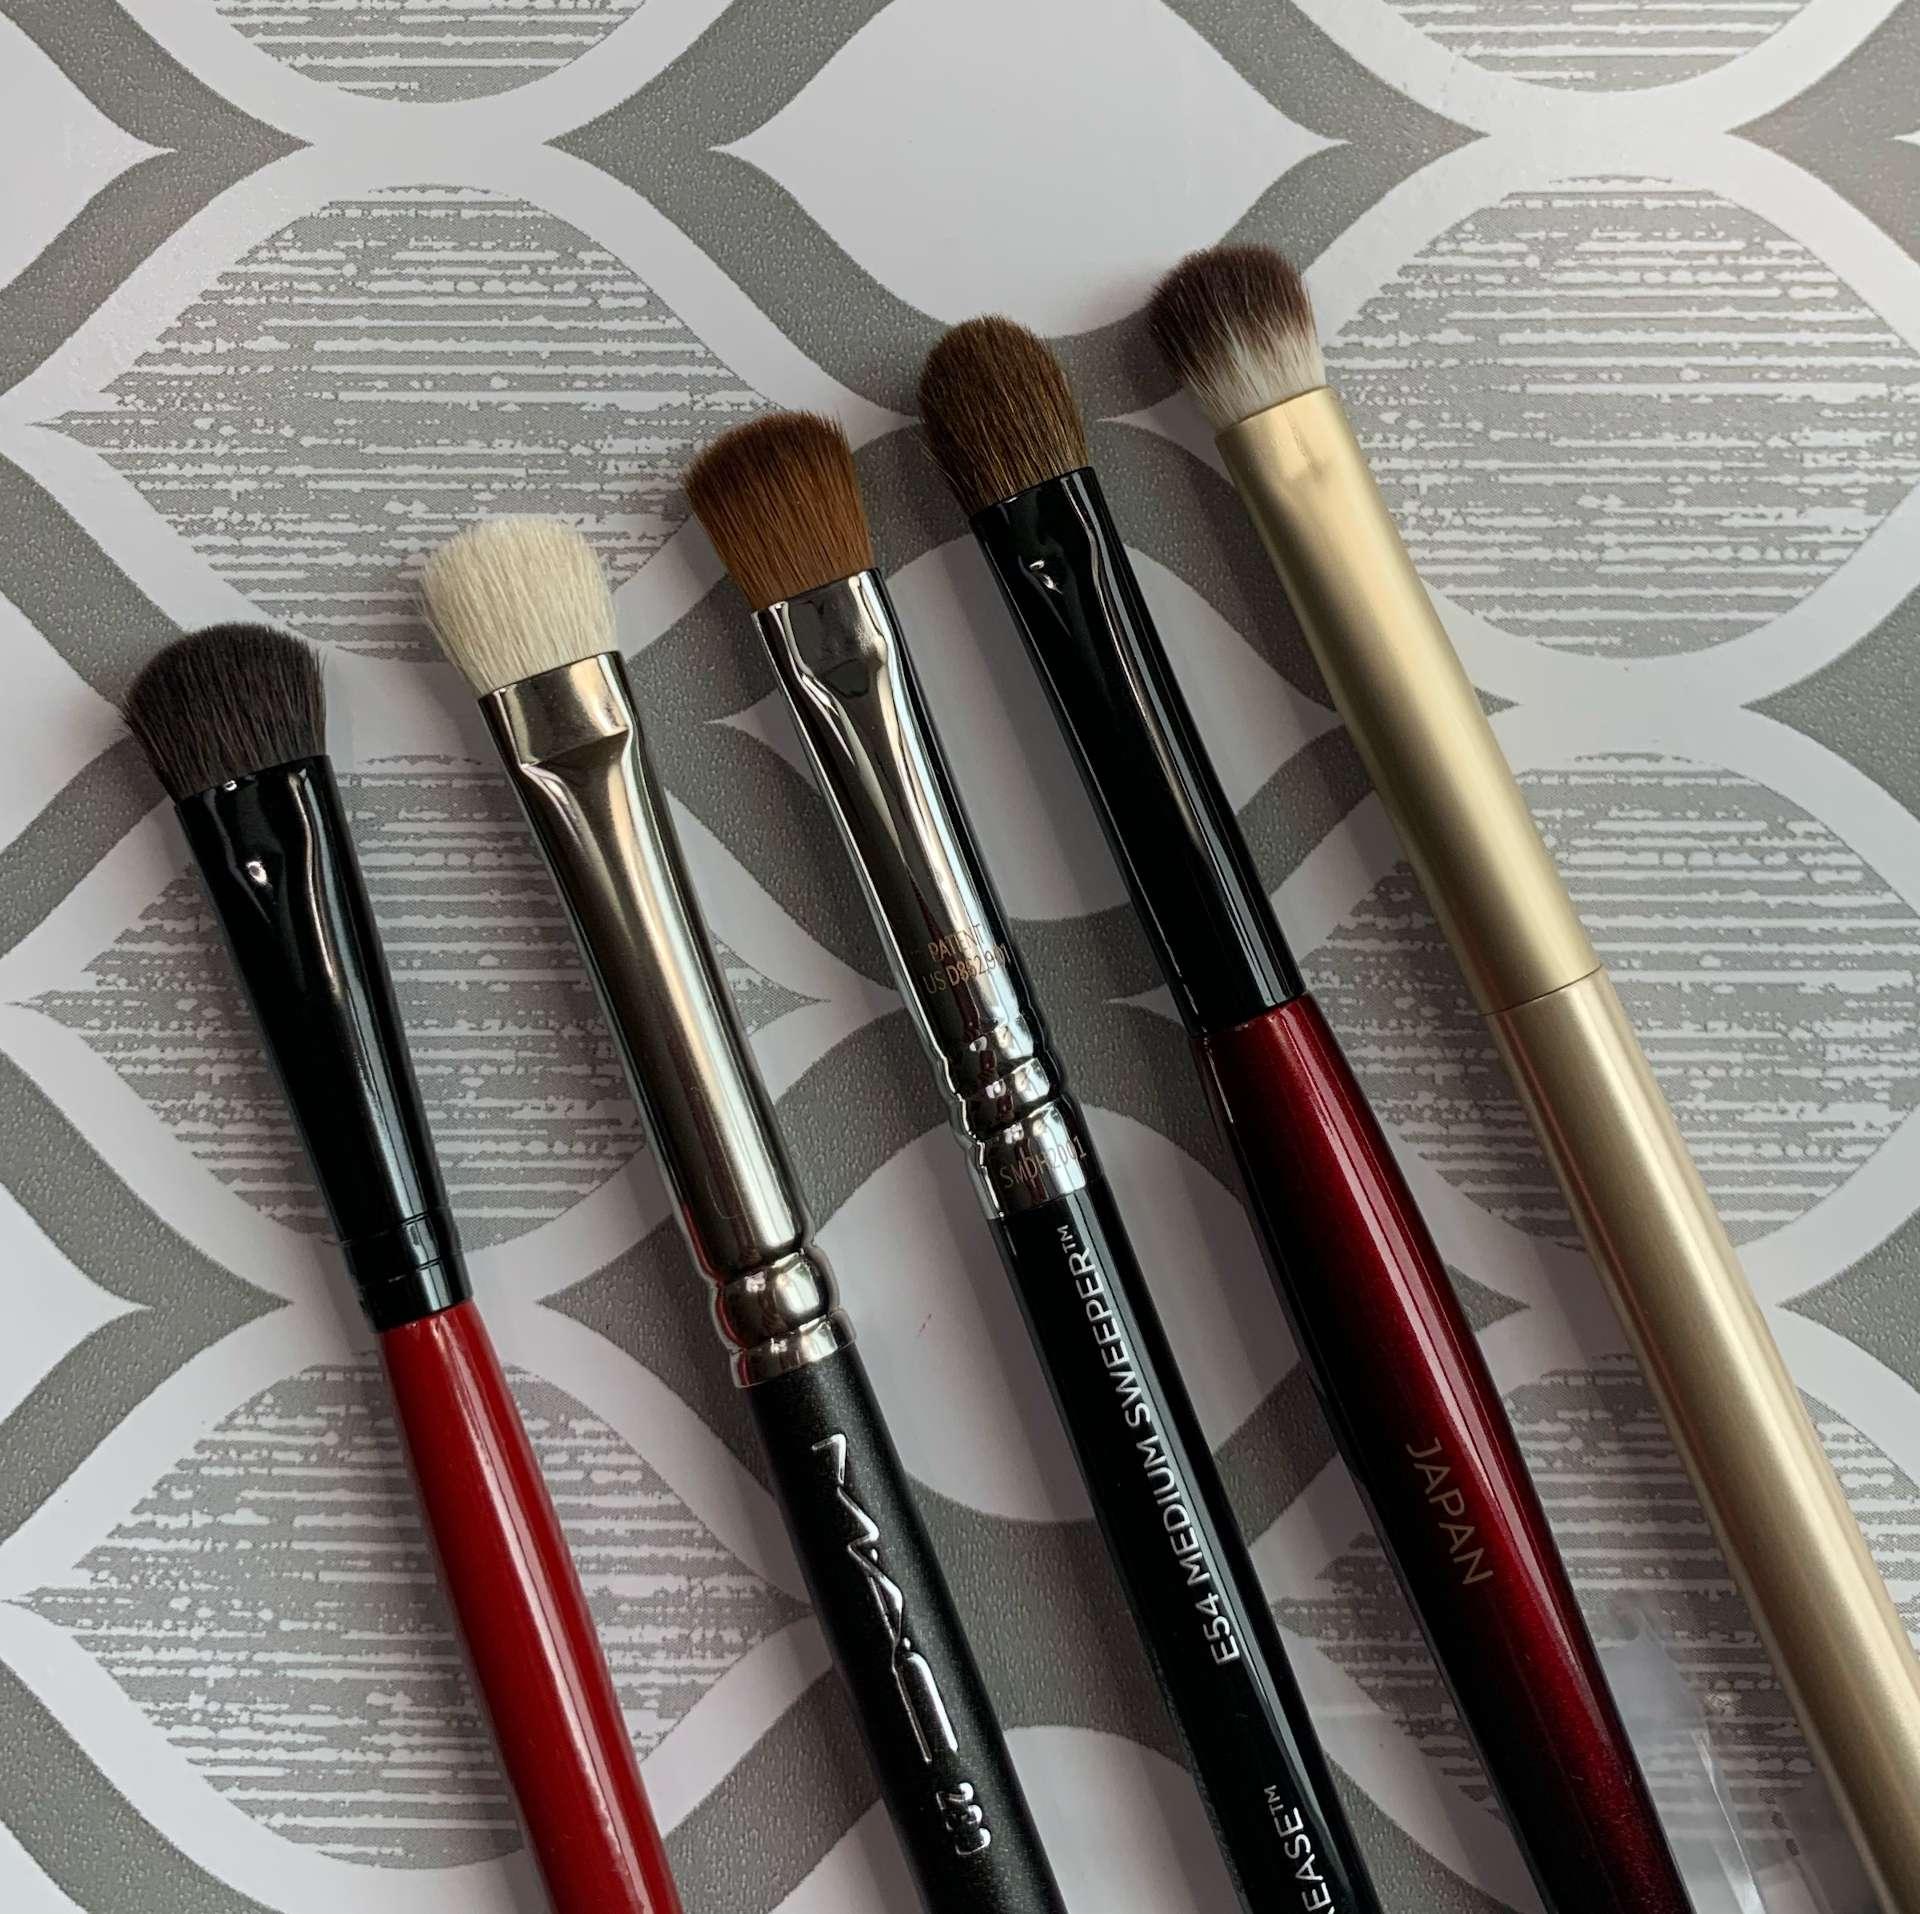 Brushes L to R: Smashbox full coverage shadow, MAC 239 natural hair, Sigma E54 medium sweeper, Sonia G builder pro, Sonia Kashuk small eyeshadow (eye shader brush comparisons))